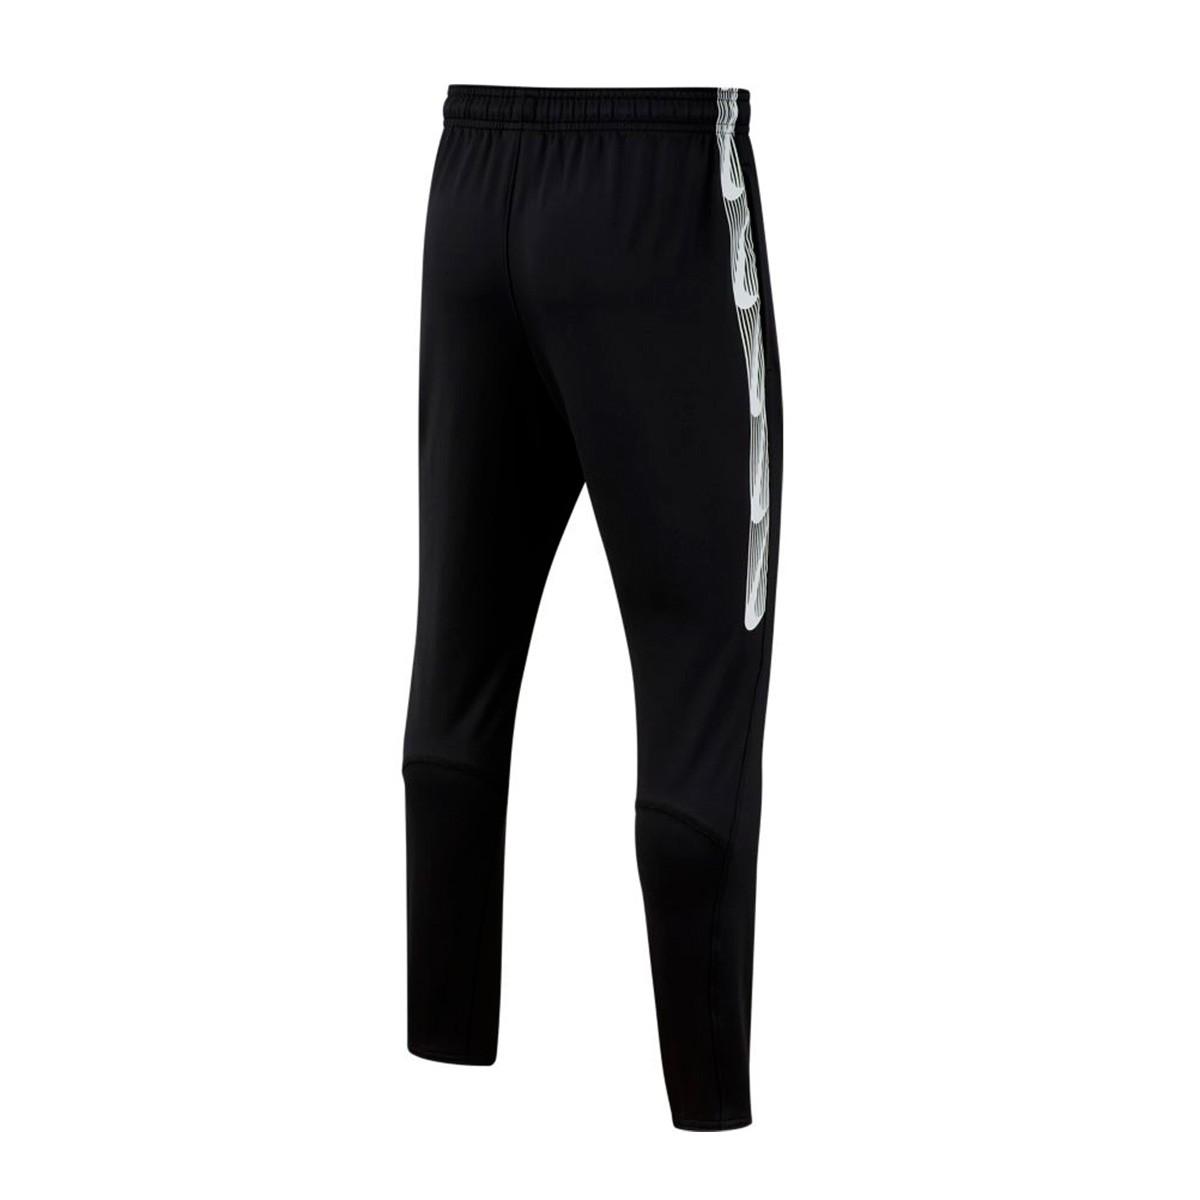 Niño Soloporteros Largo Pantalón Squad Black Es Dri White Fit Nike qvqwA14F